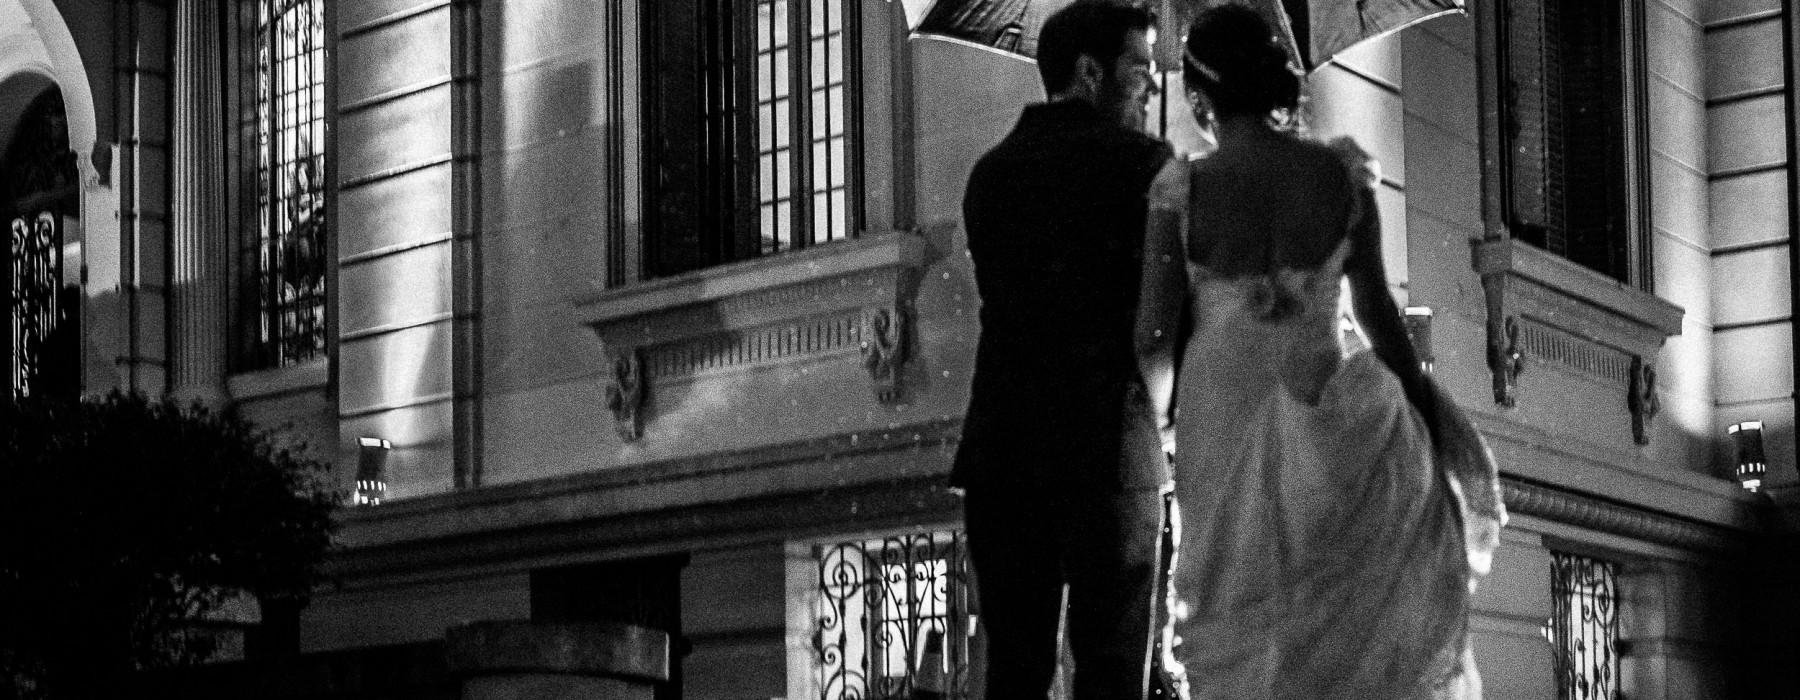 renato-dpaula-casamento-na-chuva-noivos-fotografia